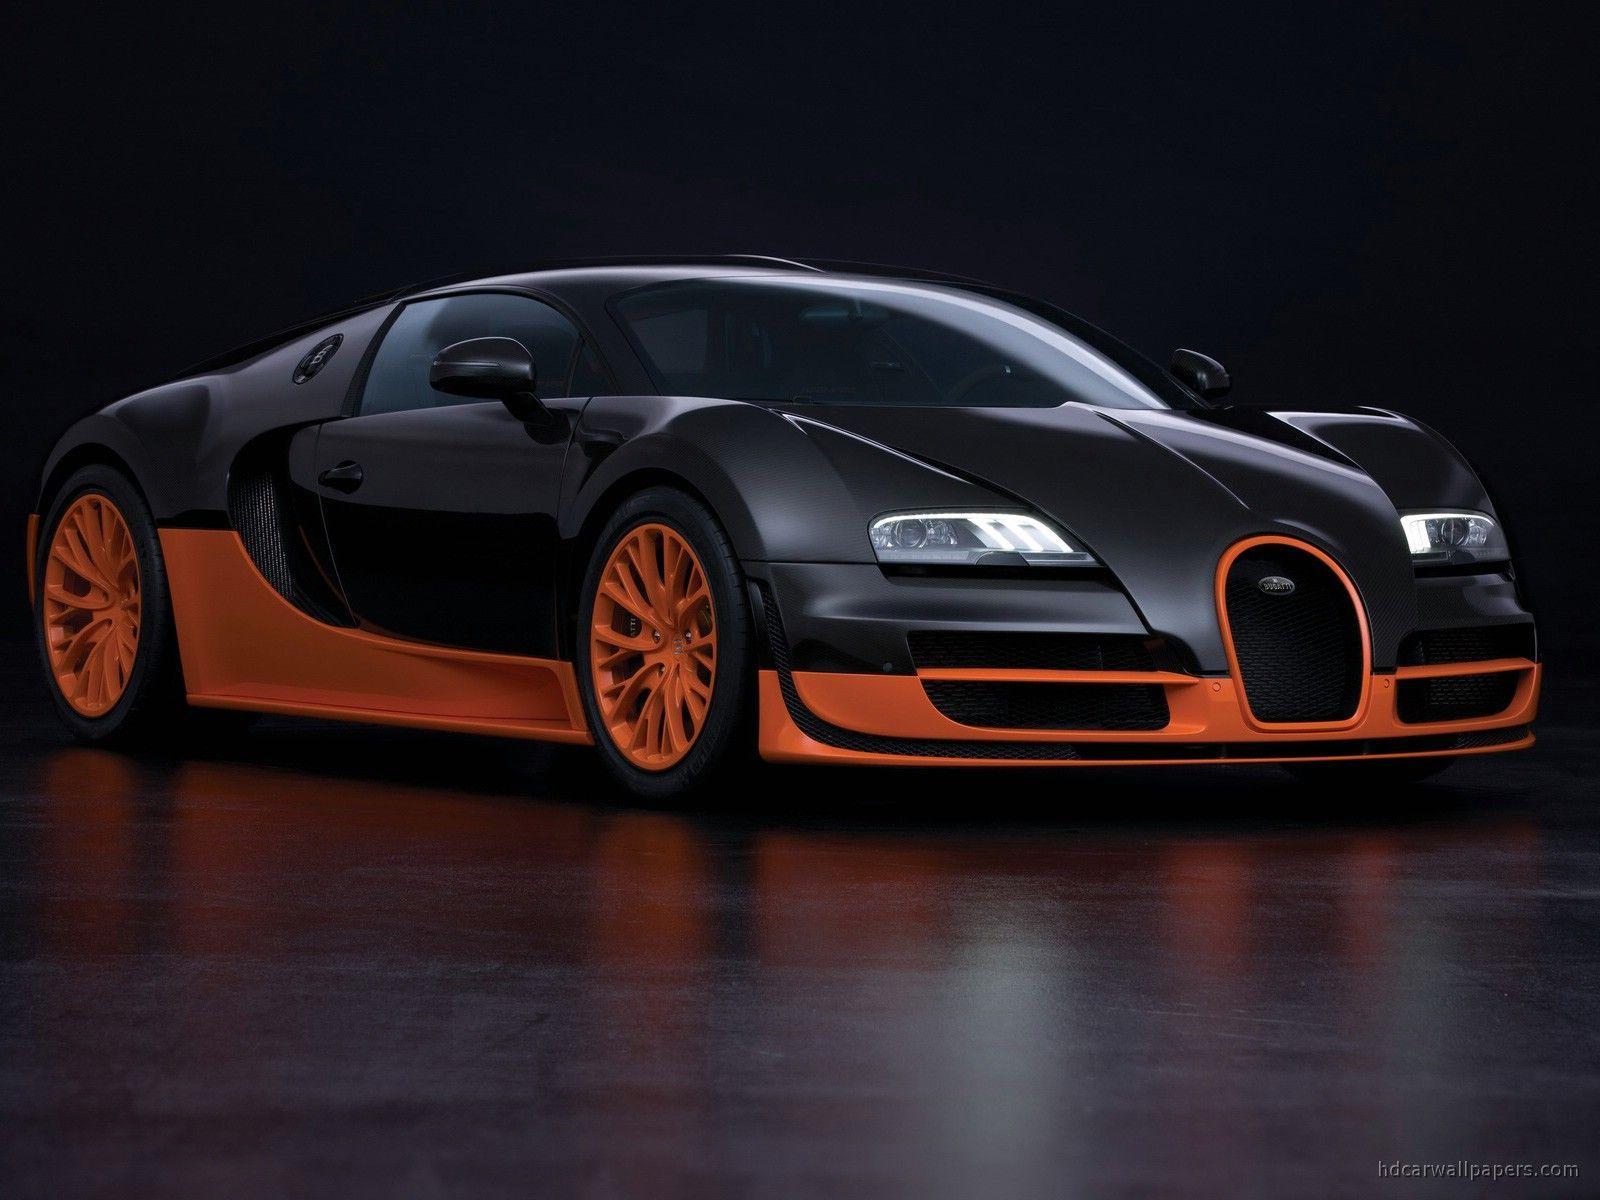 Bugatti Veyron Grand Sport Wallpapers Top Free Bugatti Veyron Grand Sport Backgrounds Wallpaperaccess